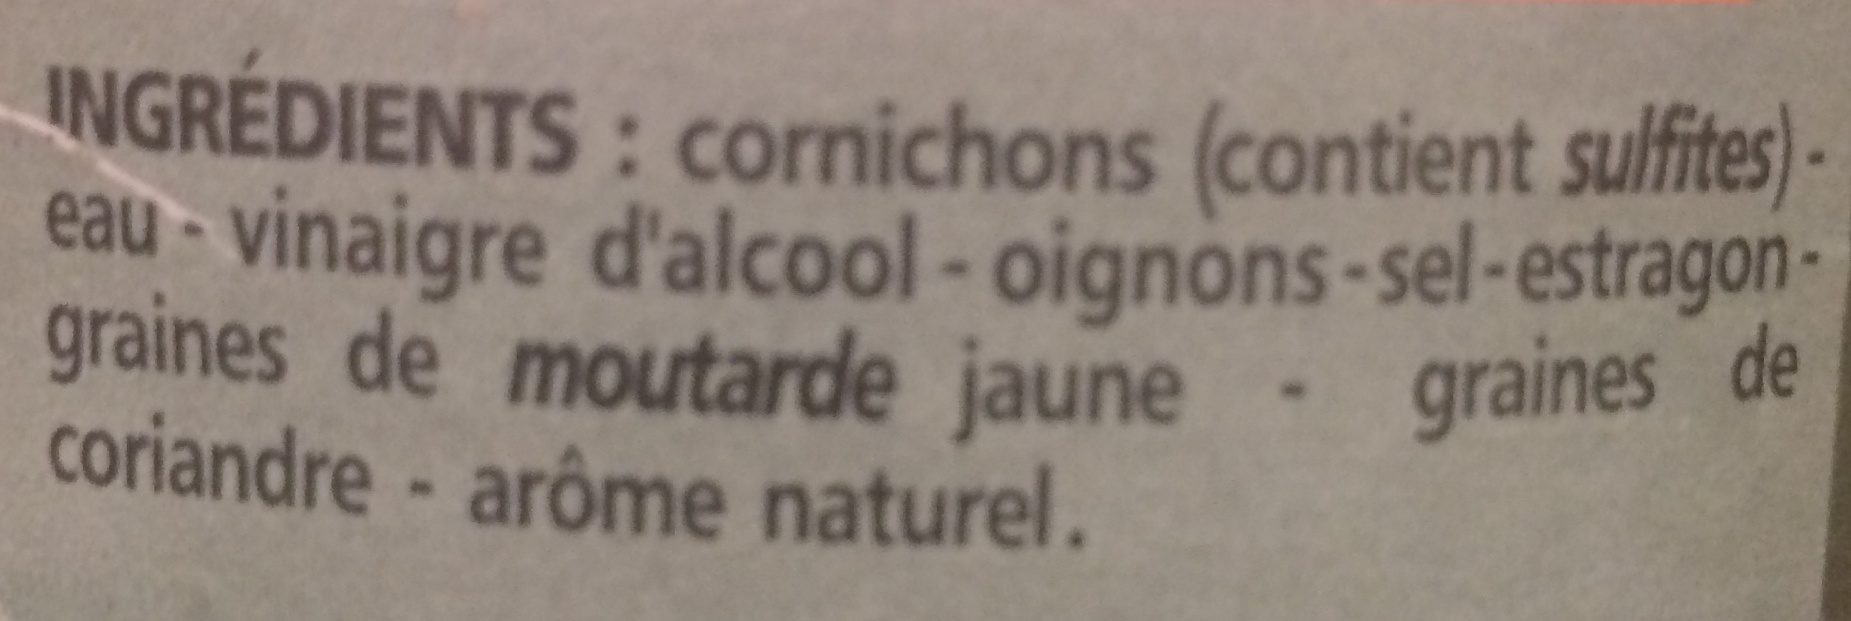 Mini-cornichons - Ingredients